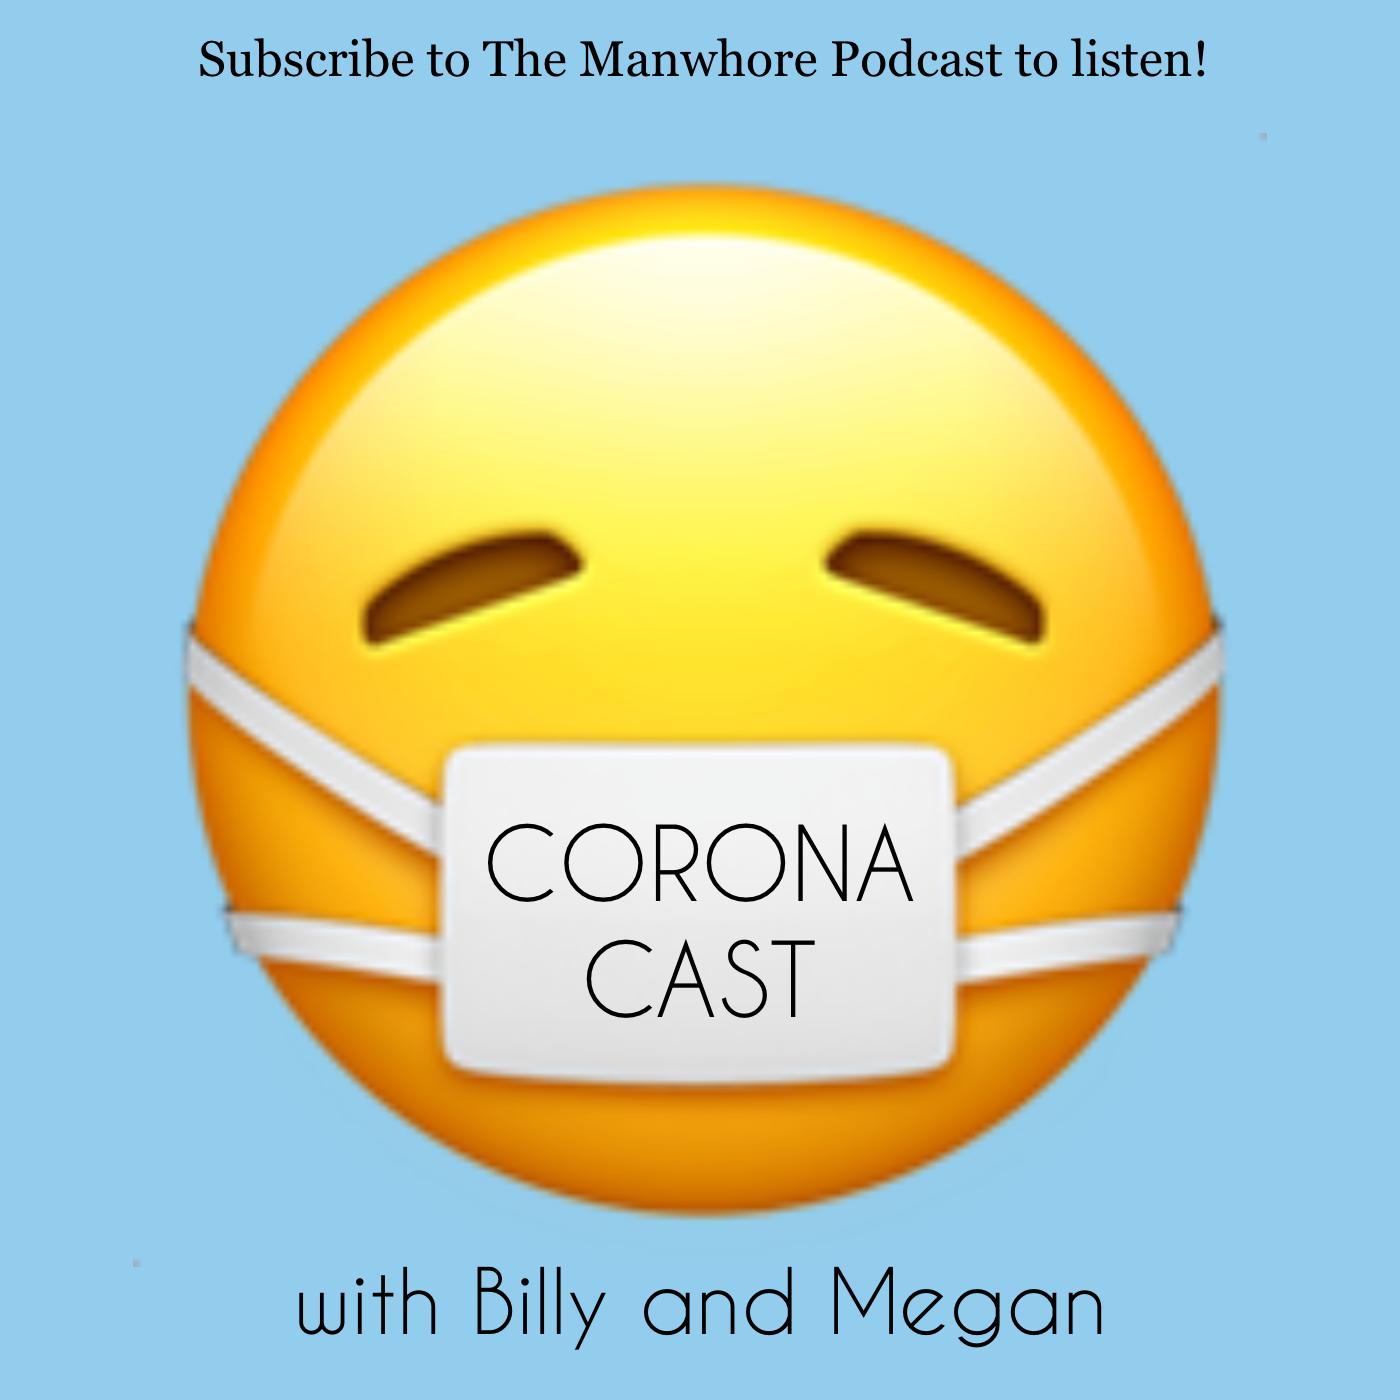 The Manwhore Podcast: A Sex-Positive Quest - Ep. 311: Corona Cast Part 1 - A Polyamorous Coronavirus Quarantine